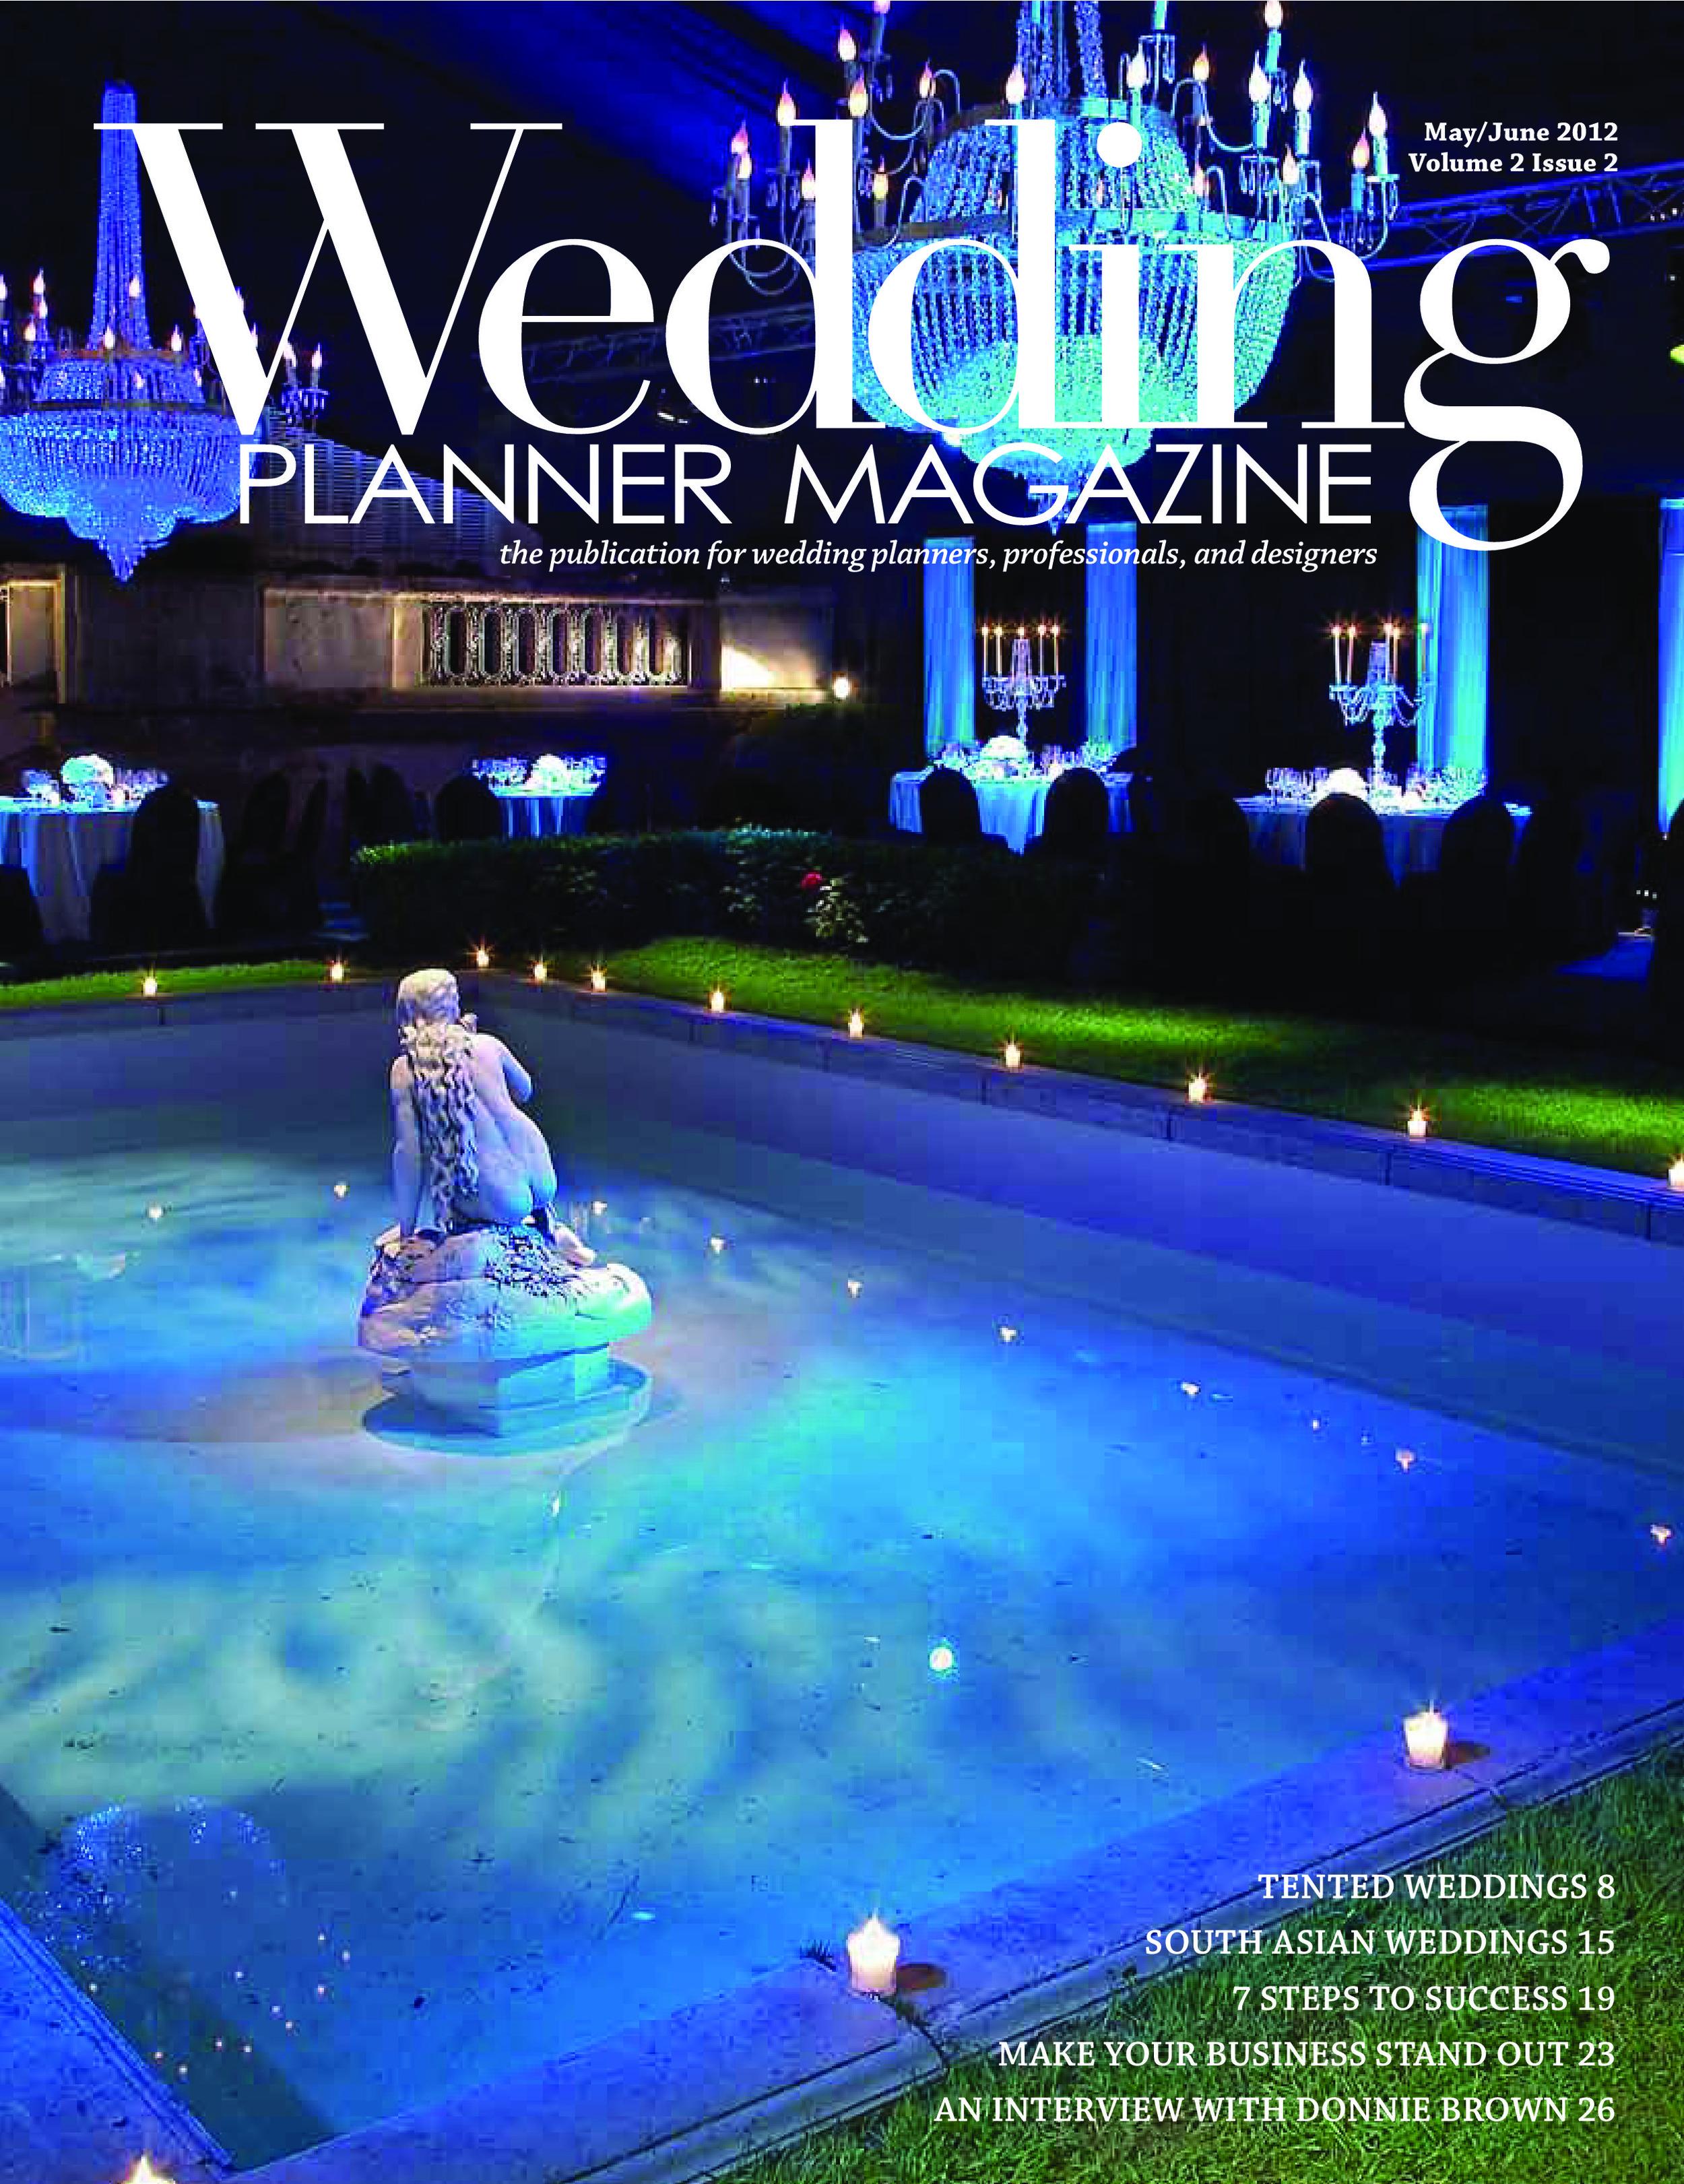 Wedding Planner Mag June 2012 Vol 2 Iss 2-page-0 (2).jpg